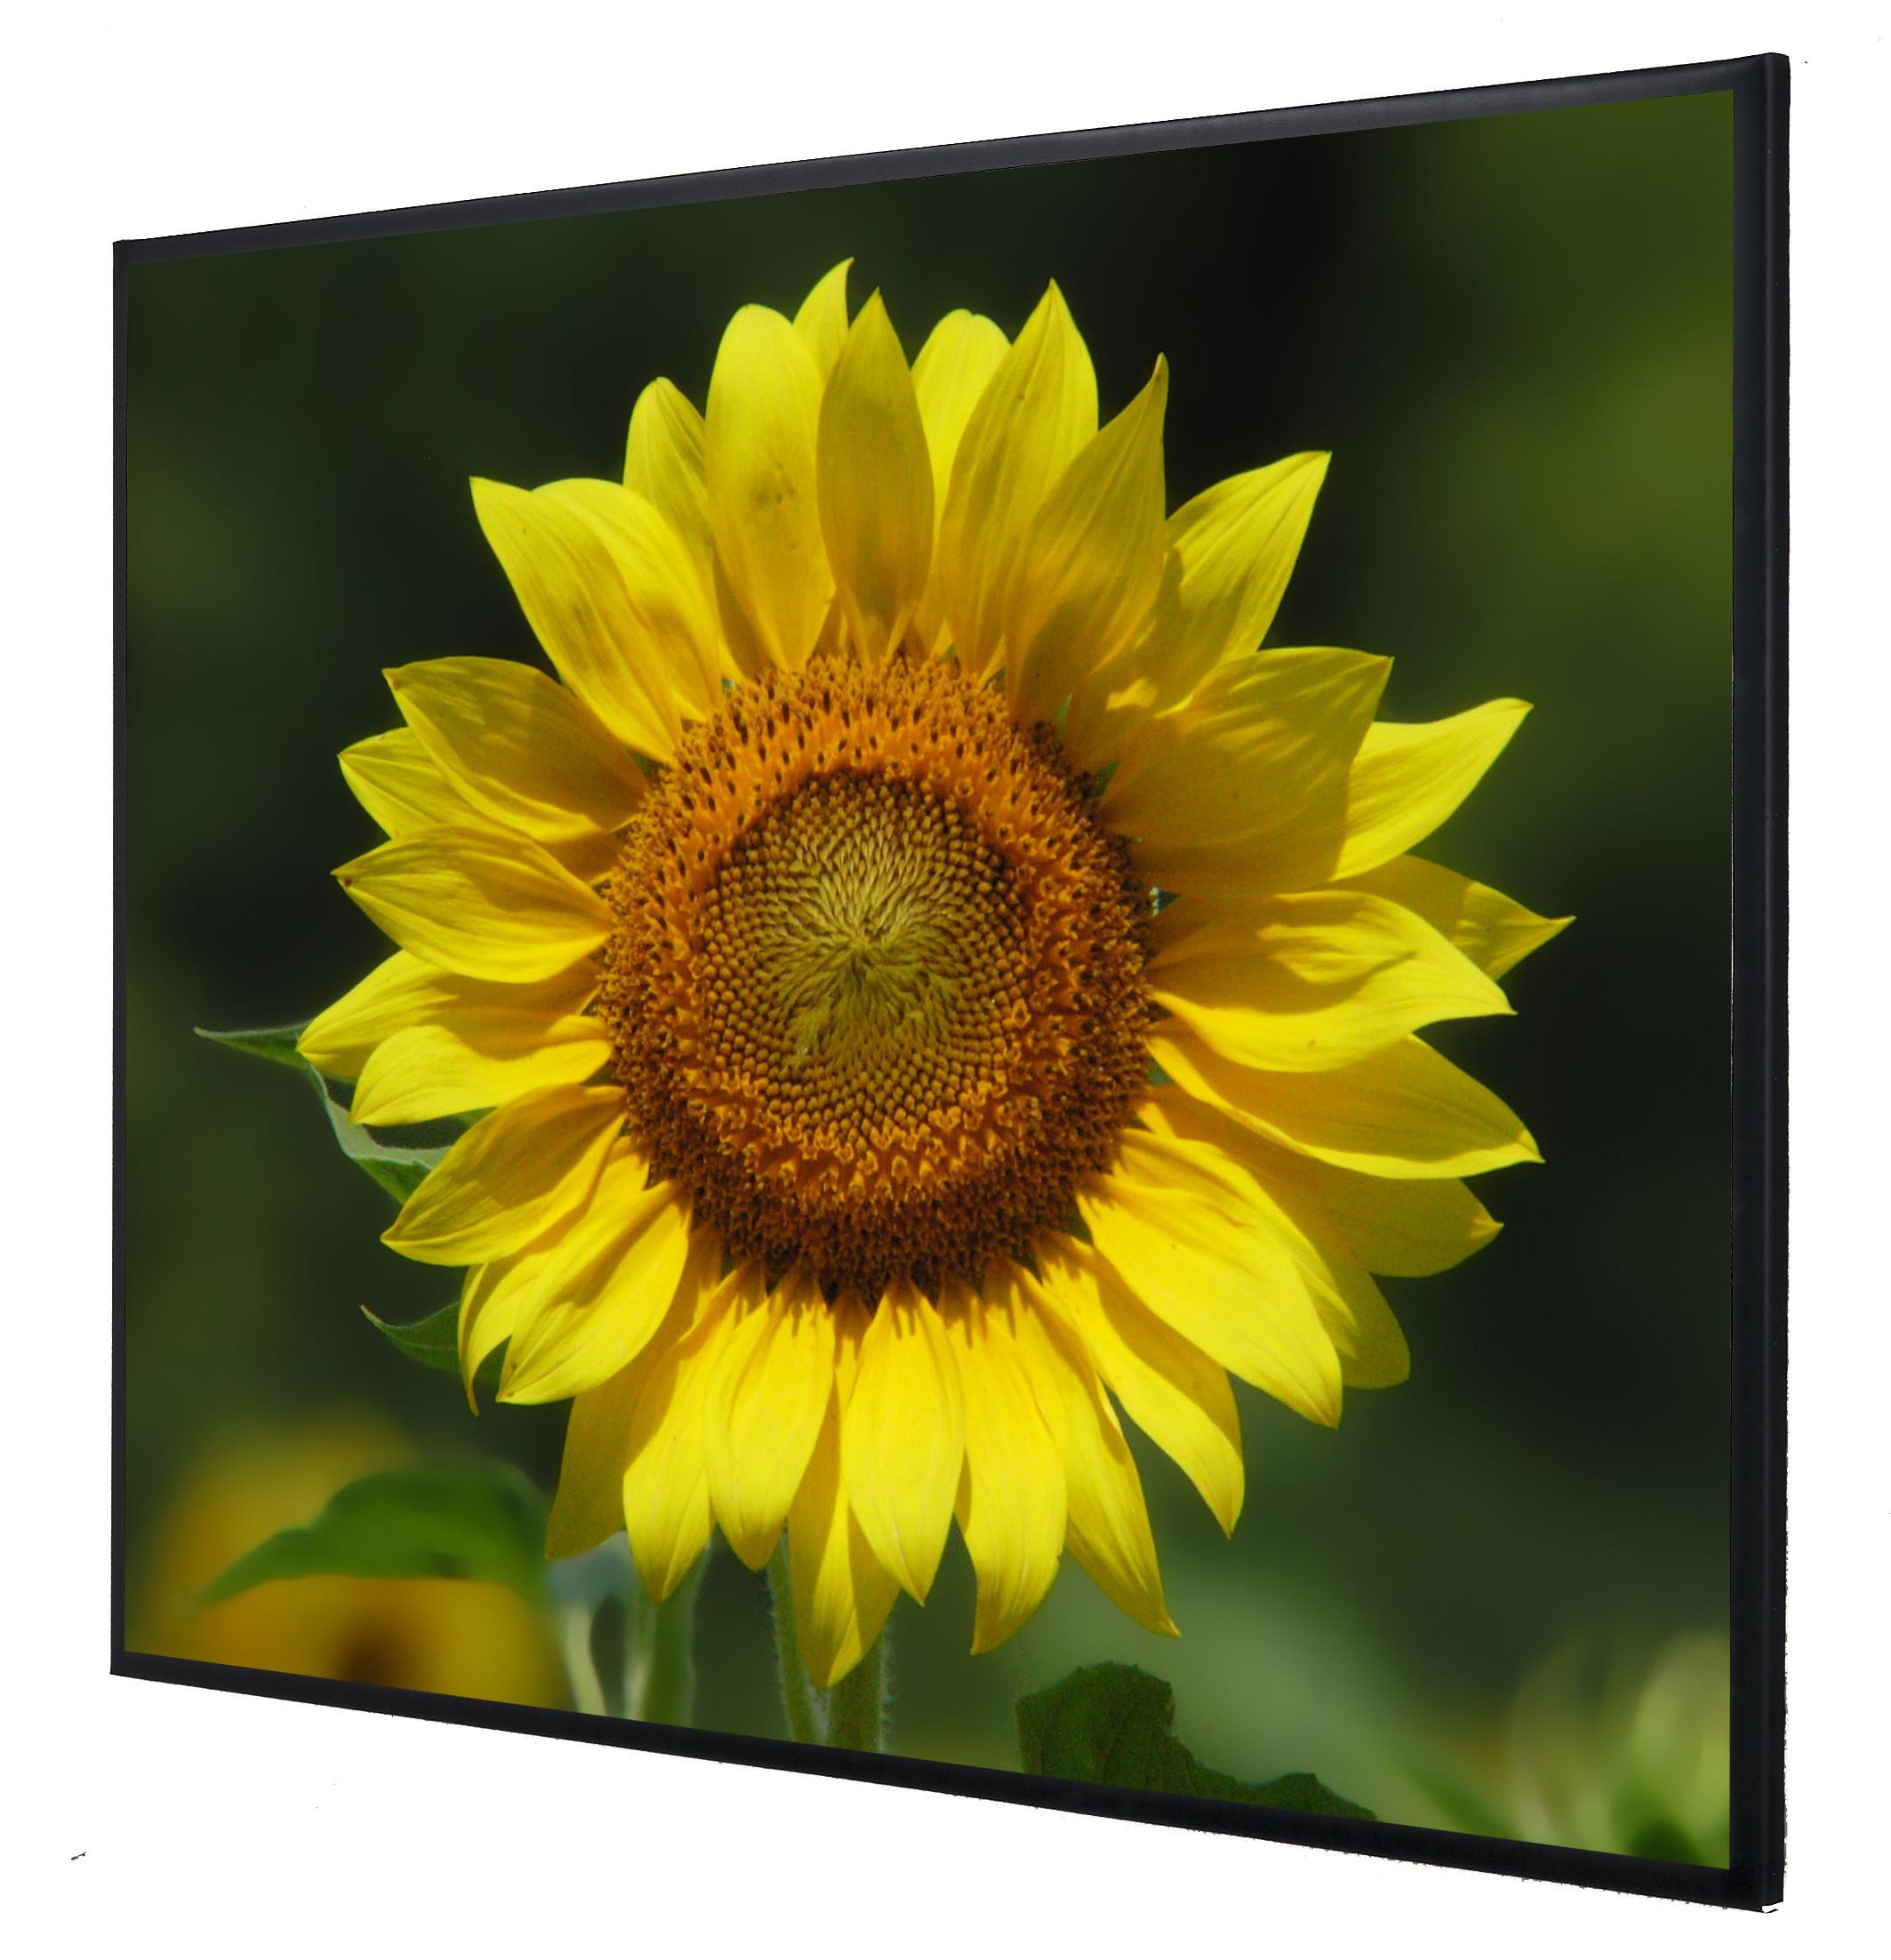 Vision Light 220 x 165 cm video format med Veltex og ReAct filmdug